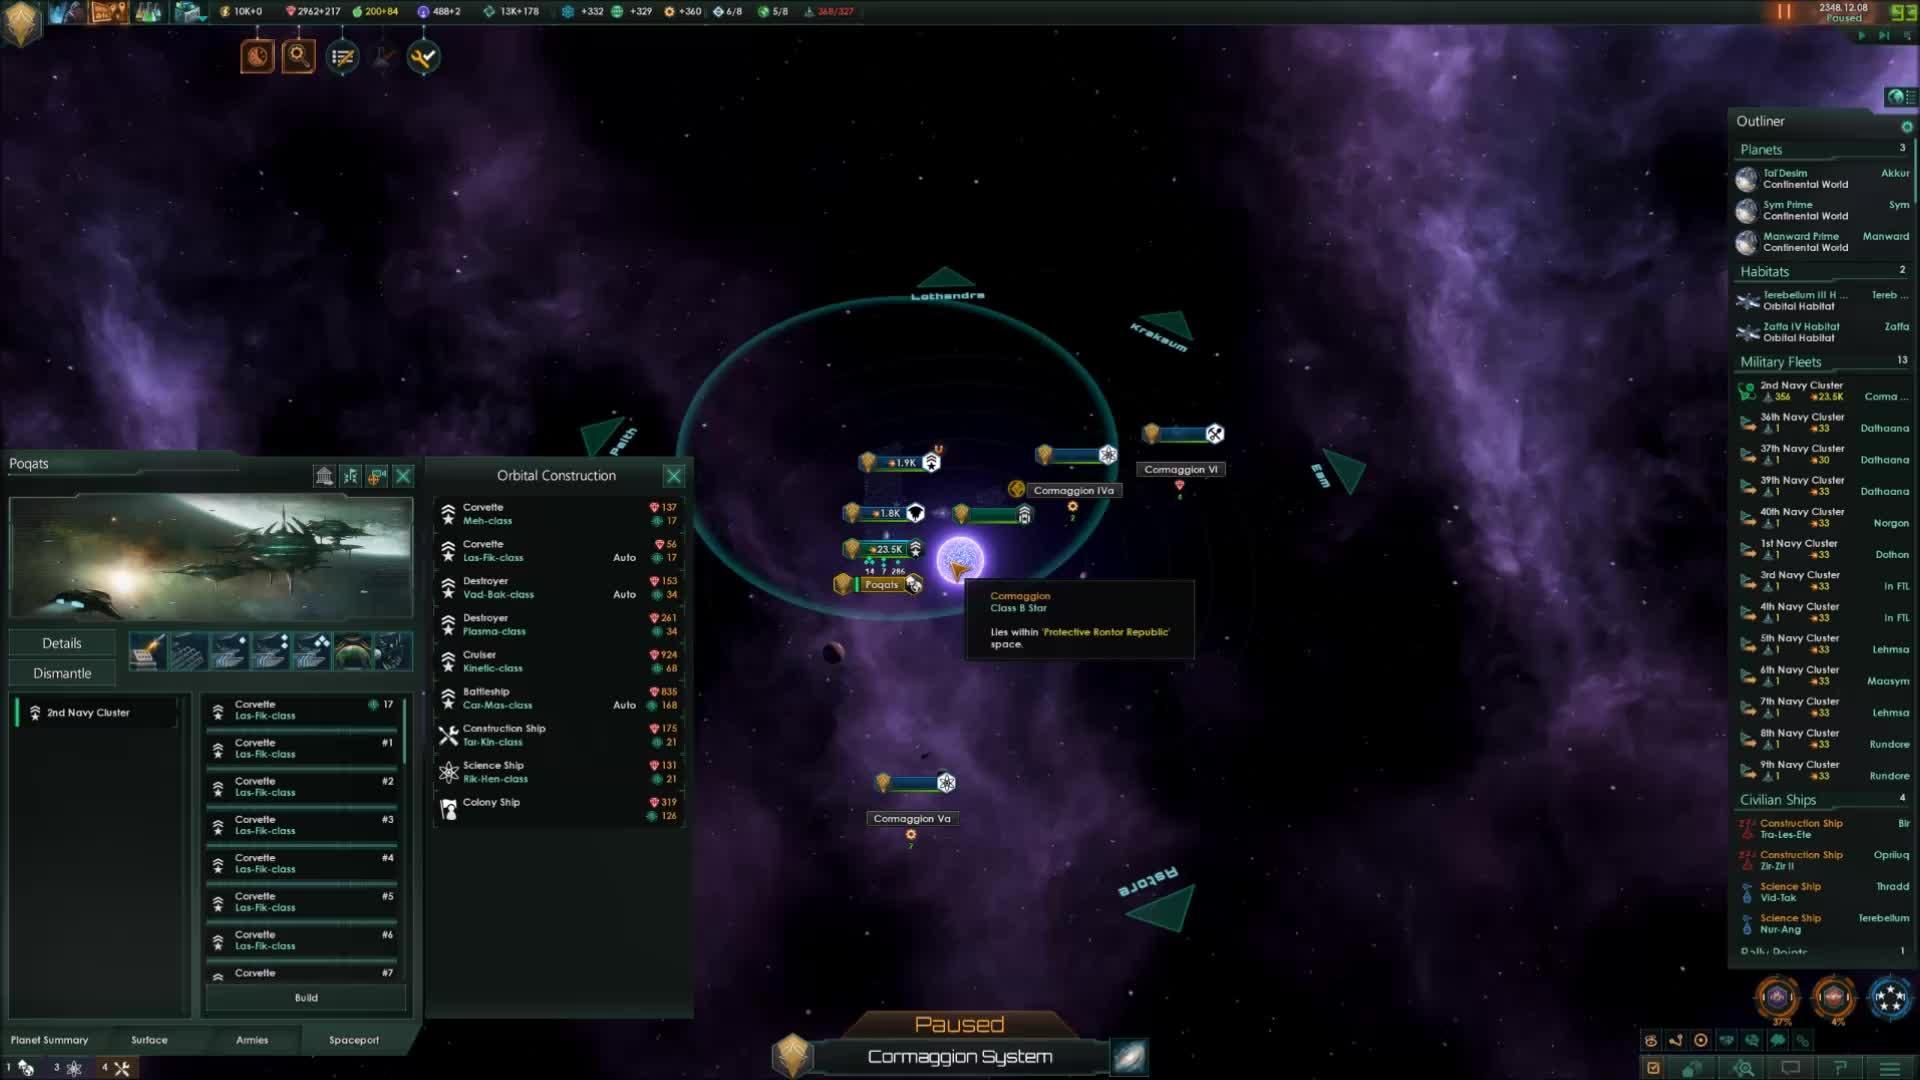 stellaris, corvettes are op GIFs